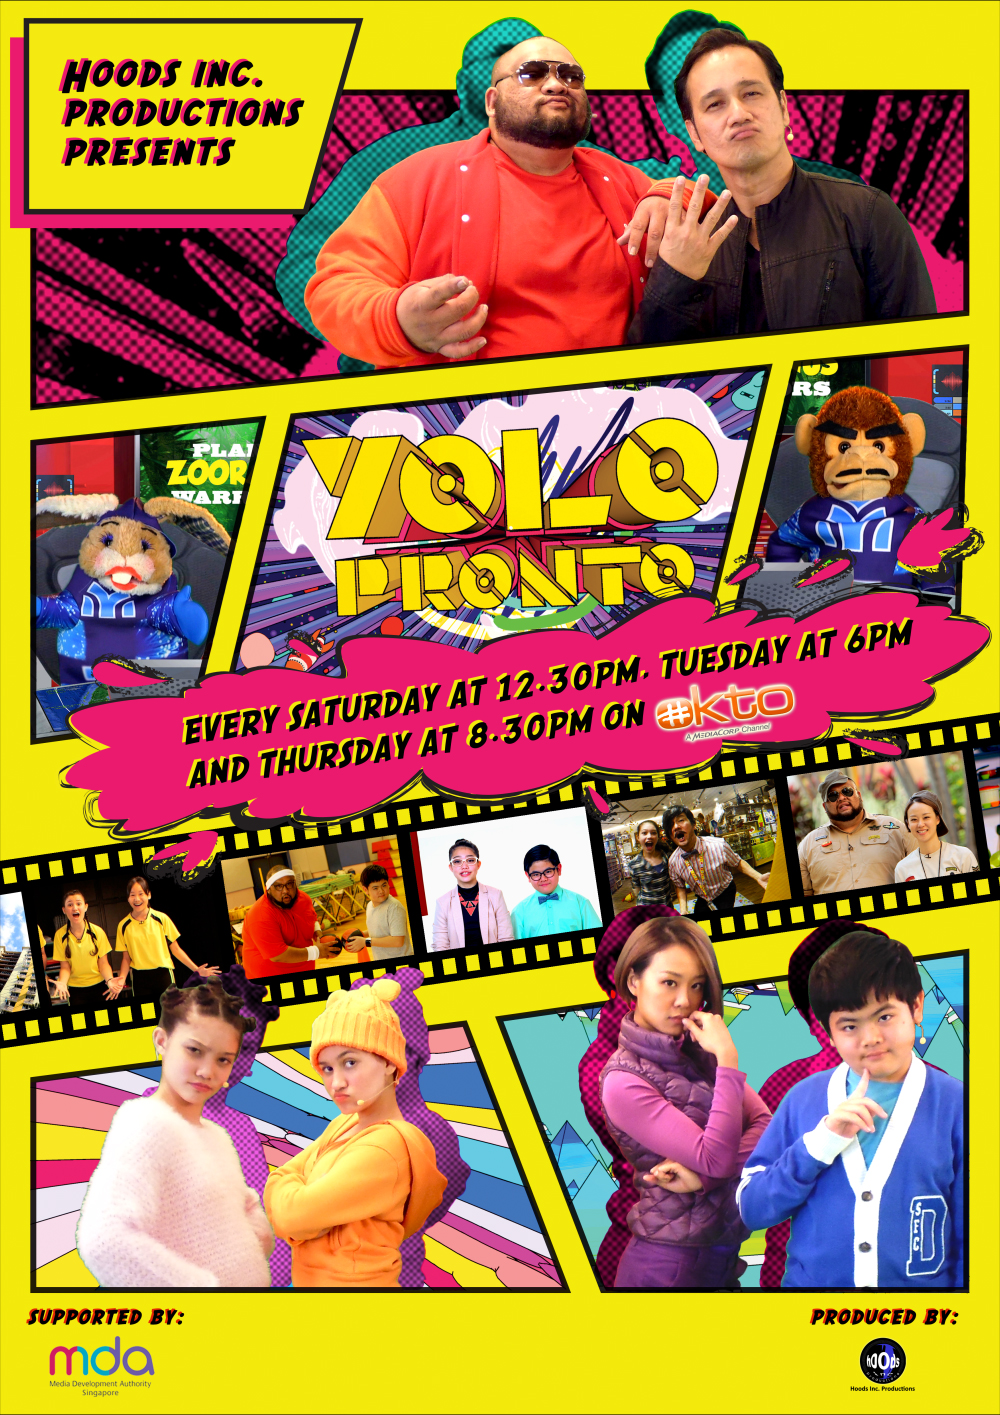 Yolo Pronto poster